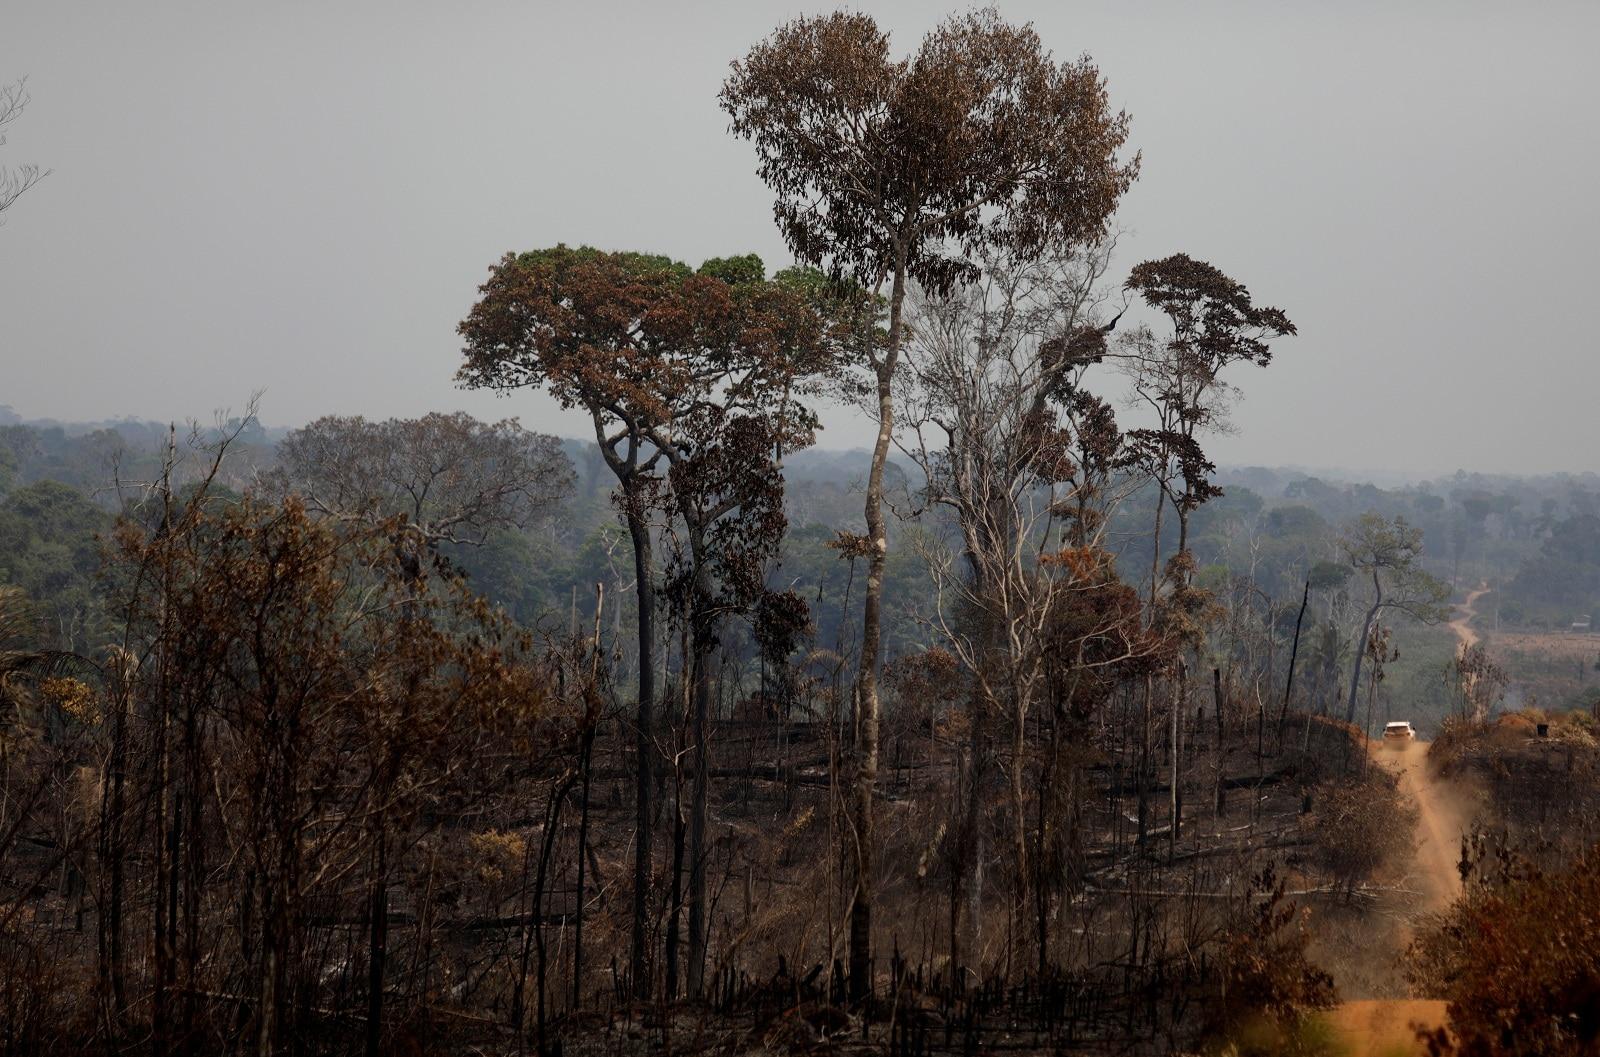 A car drives past a burning tract of Amazon jungle in Porto Velho, Brazil August 25, 2019. REUTERS/Ricardo Moraes